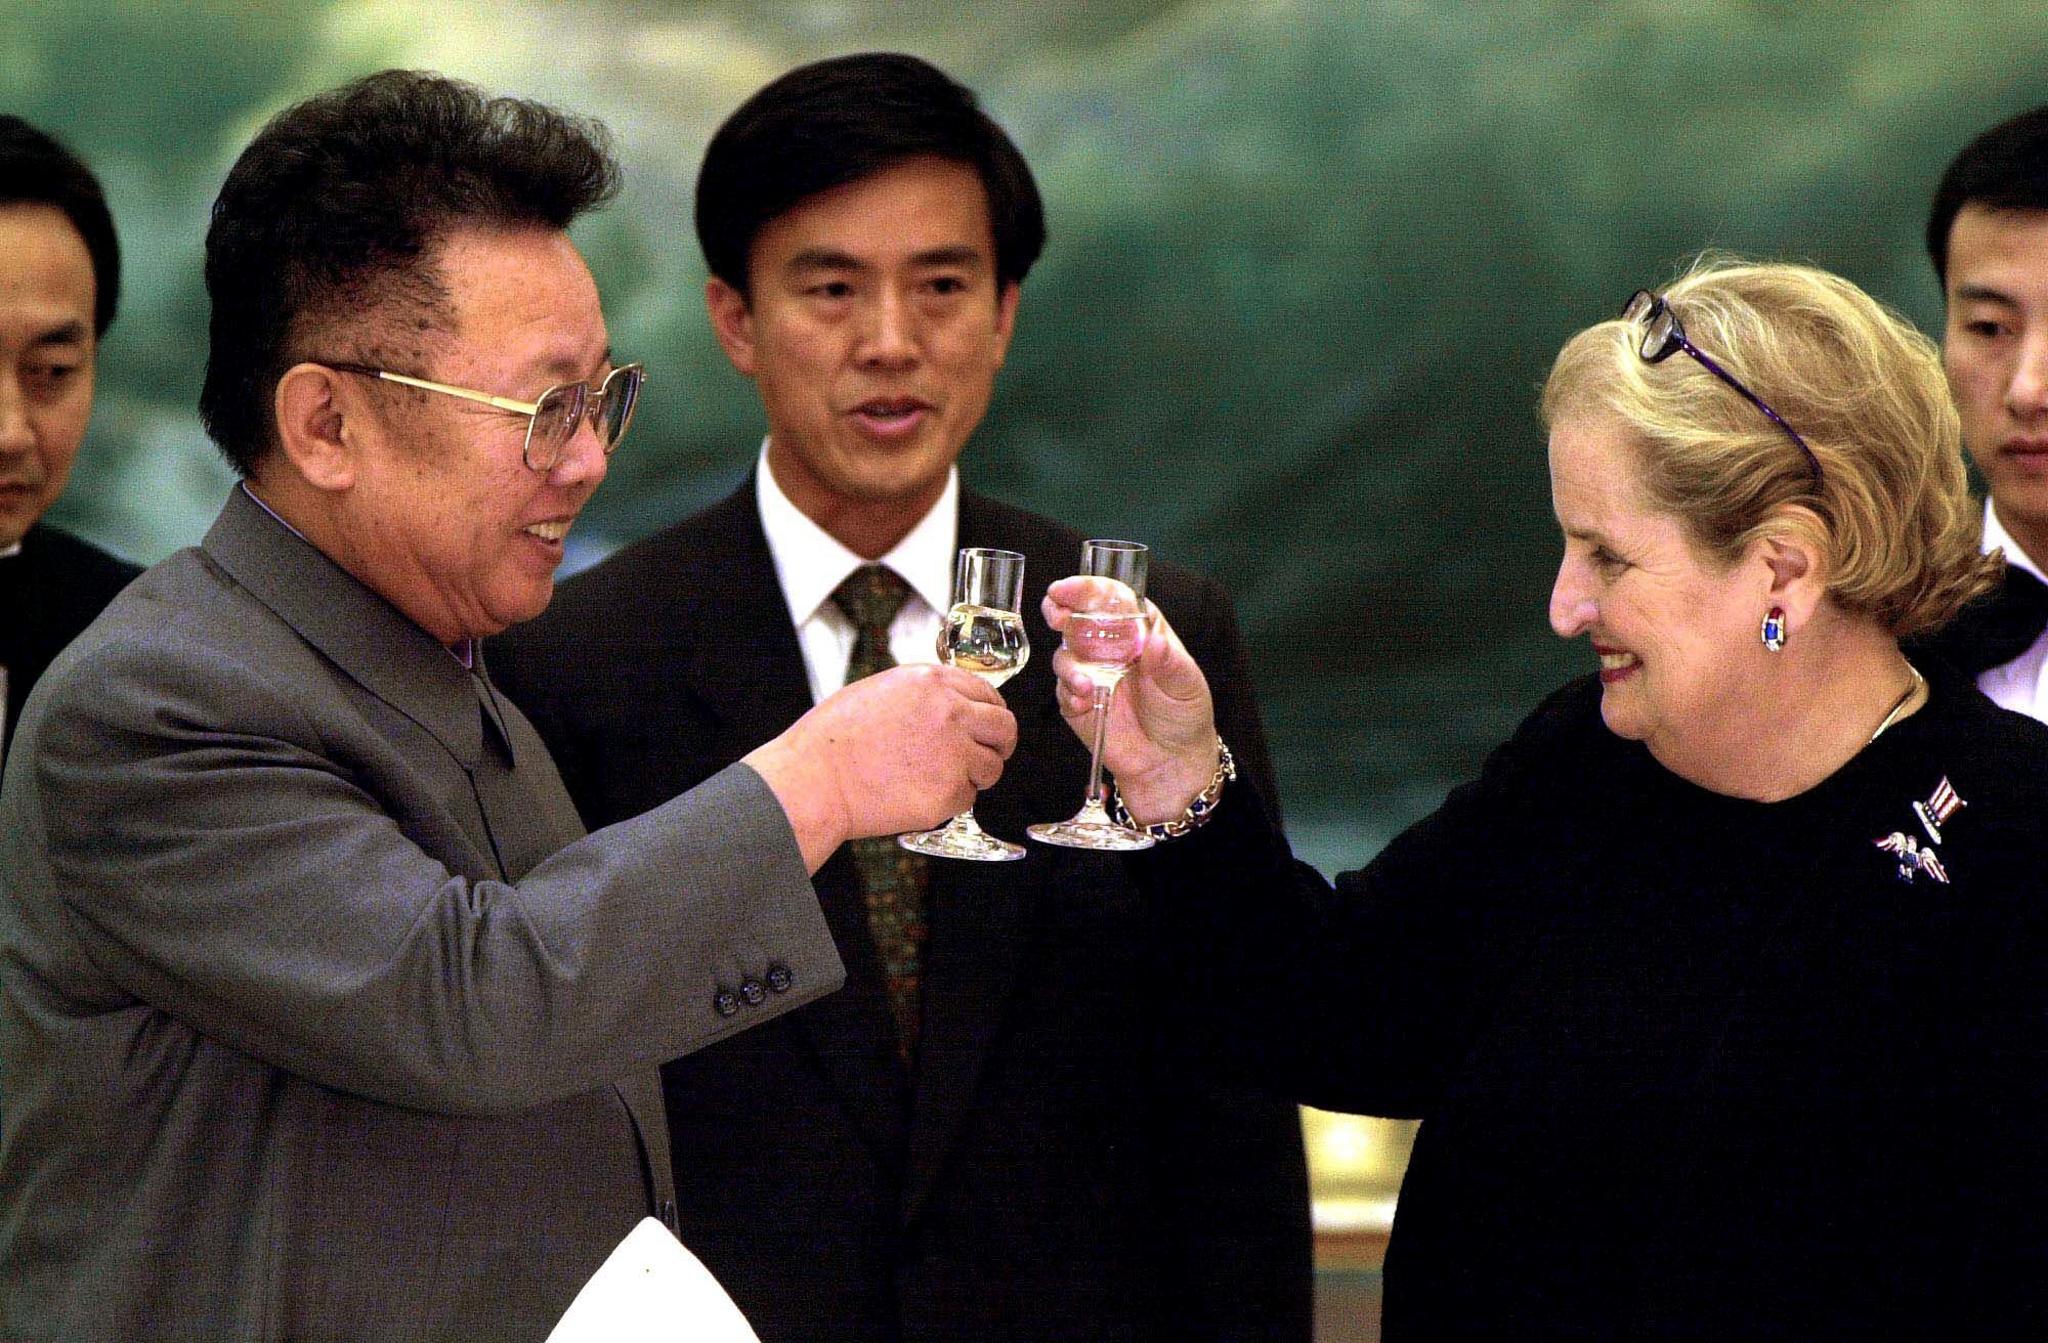 North Korean leader Kim Jong Il (L) toasts US Secretary of State Madeleine Albright